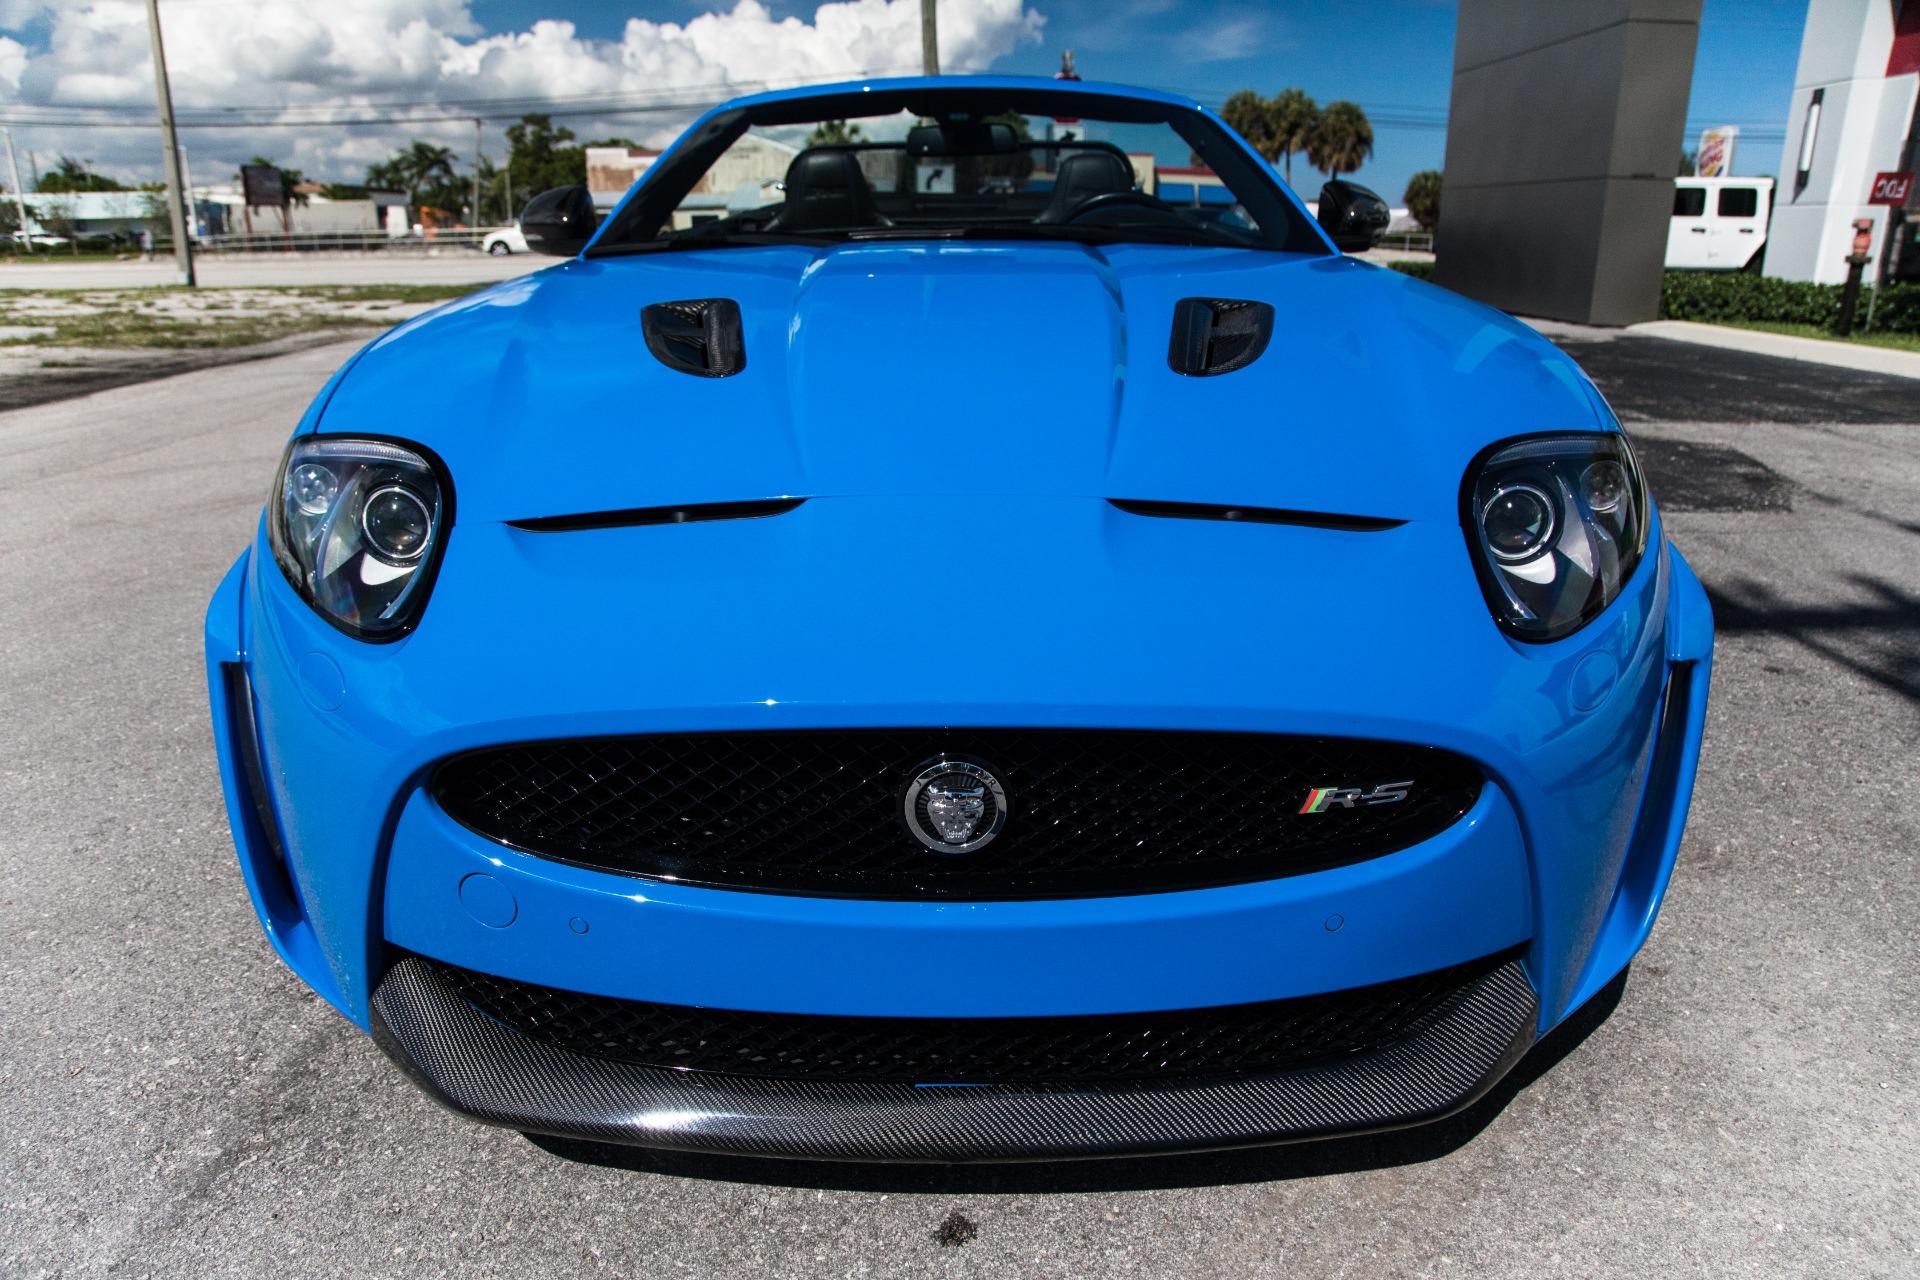 Used 2014 Jaguar XK XKR-S For Sale ($64,900) | Marino ...